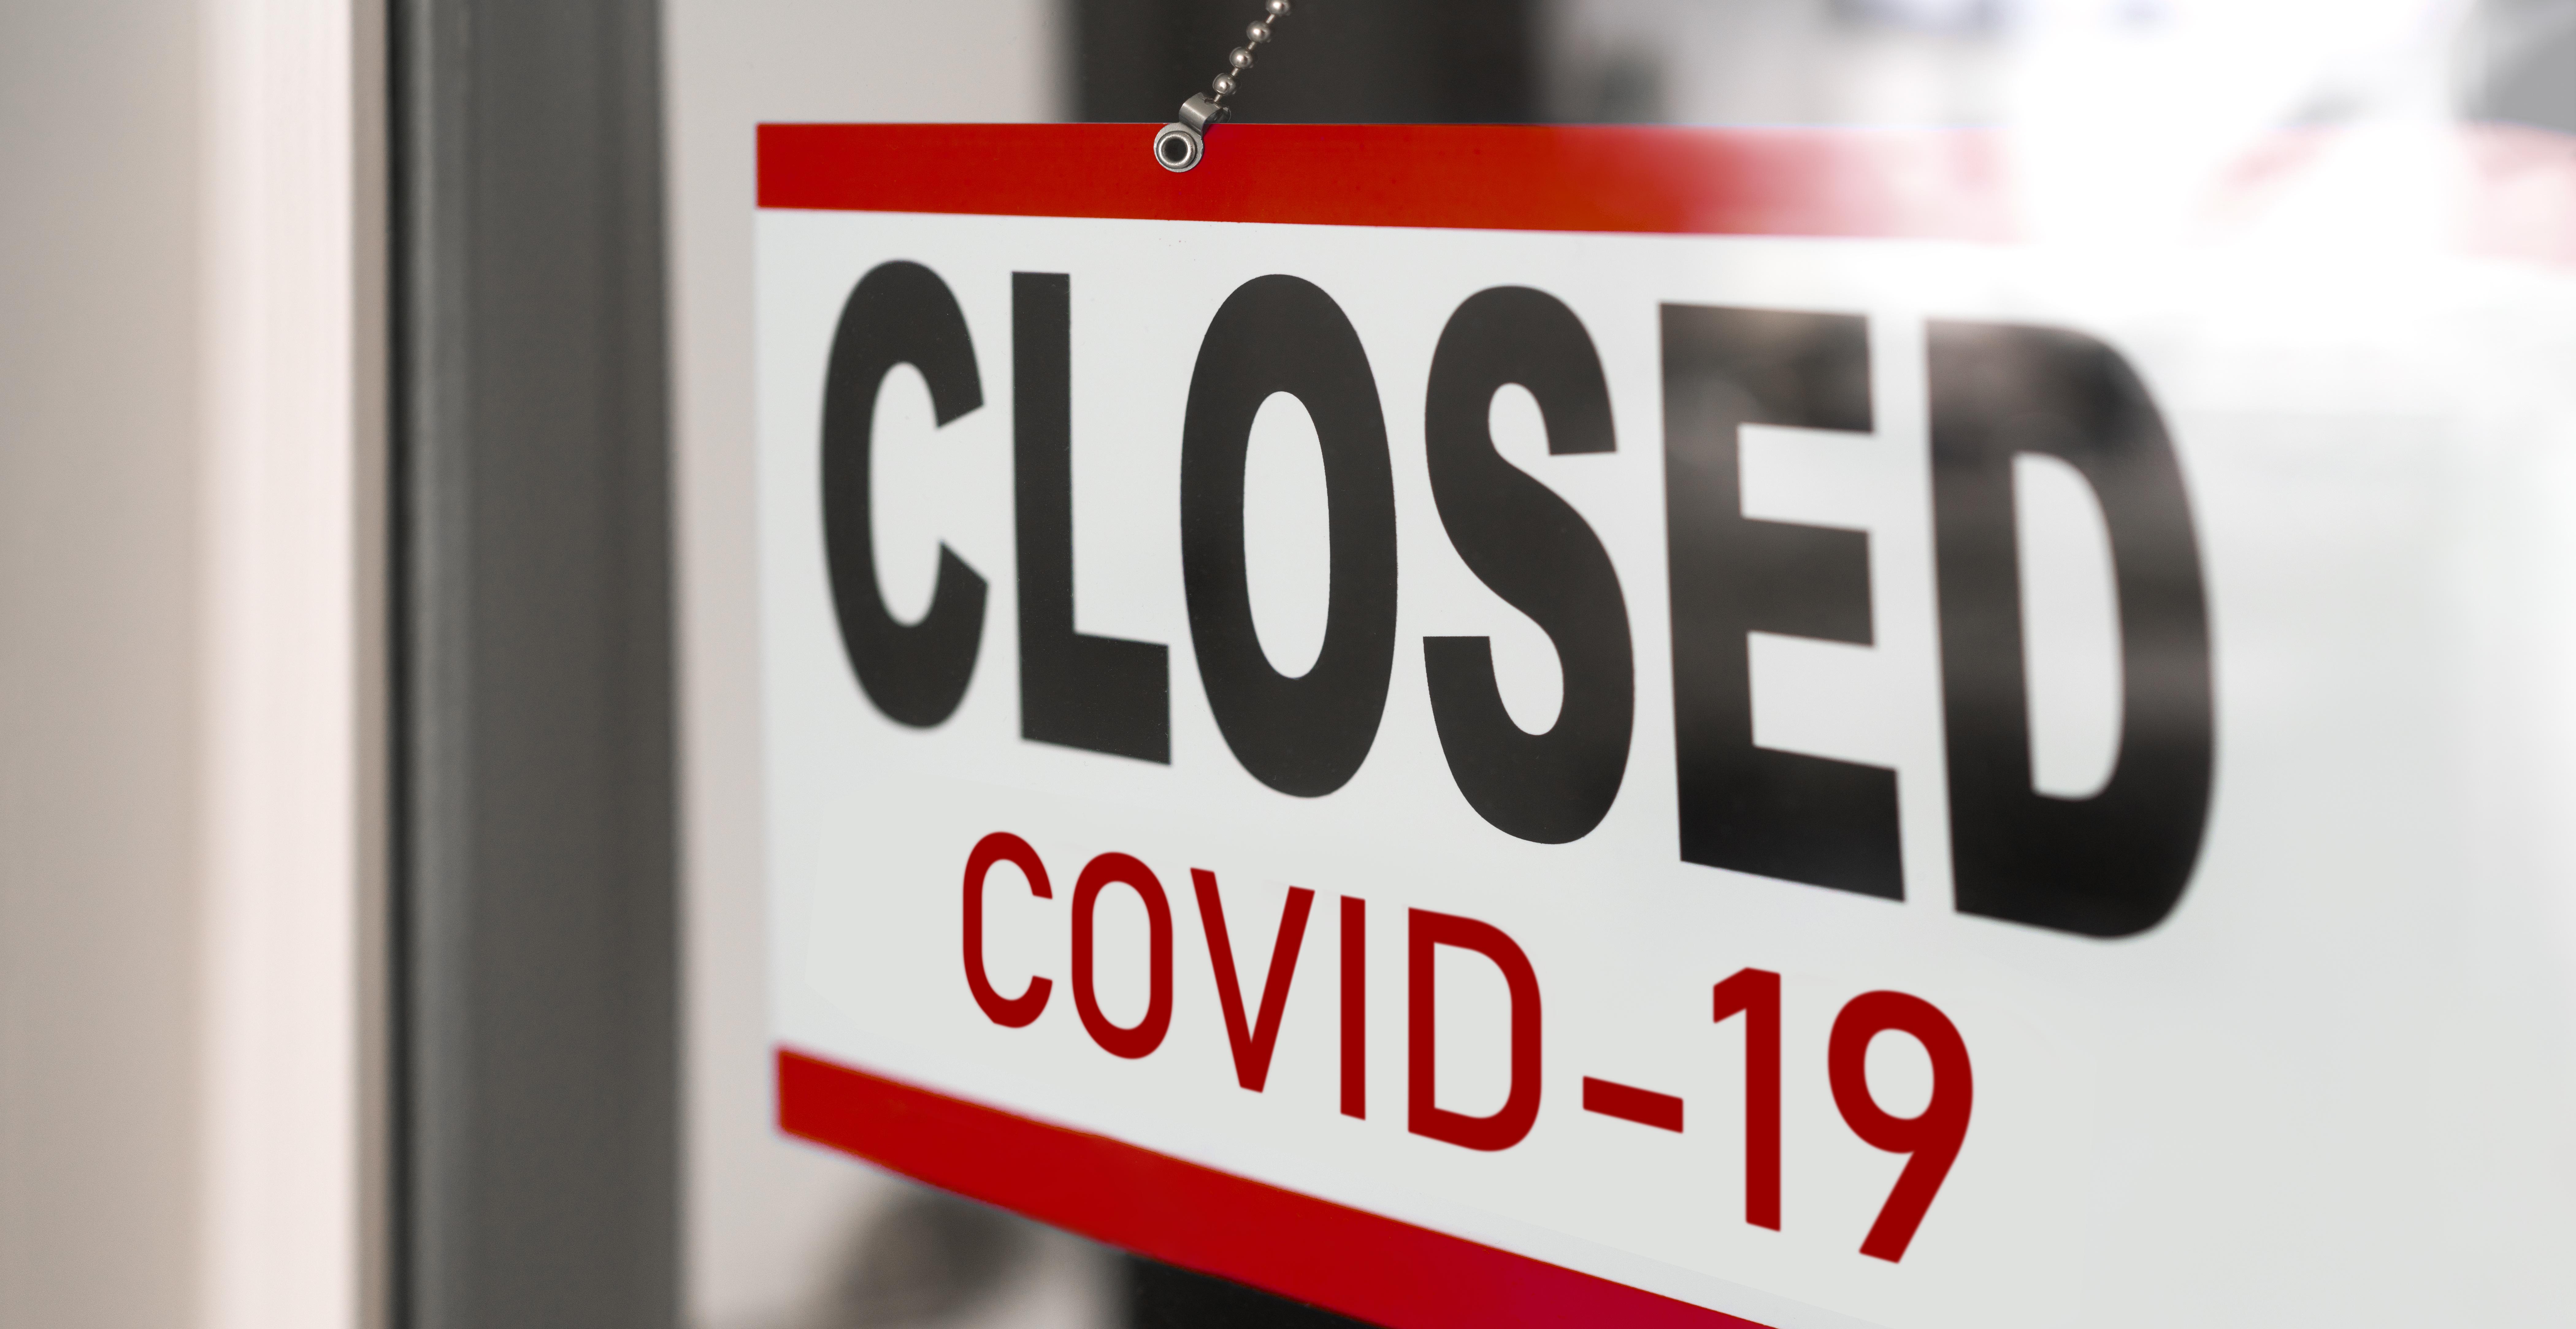 CIOs & COVID-19: Navigating a New World